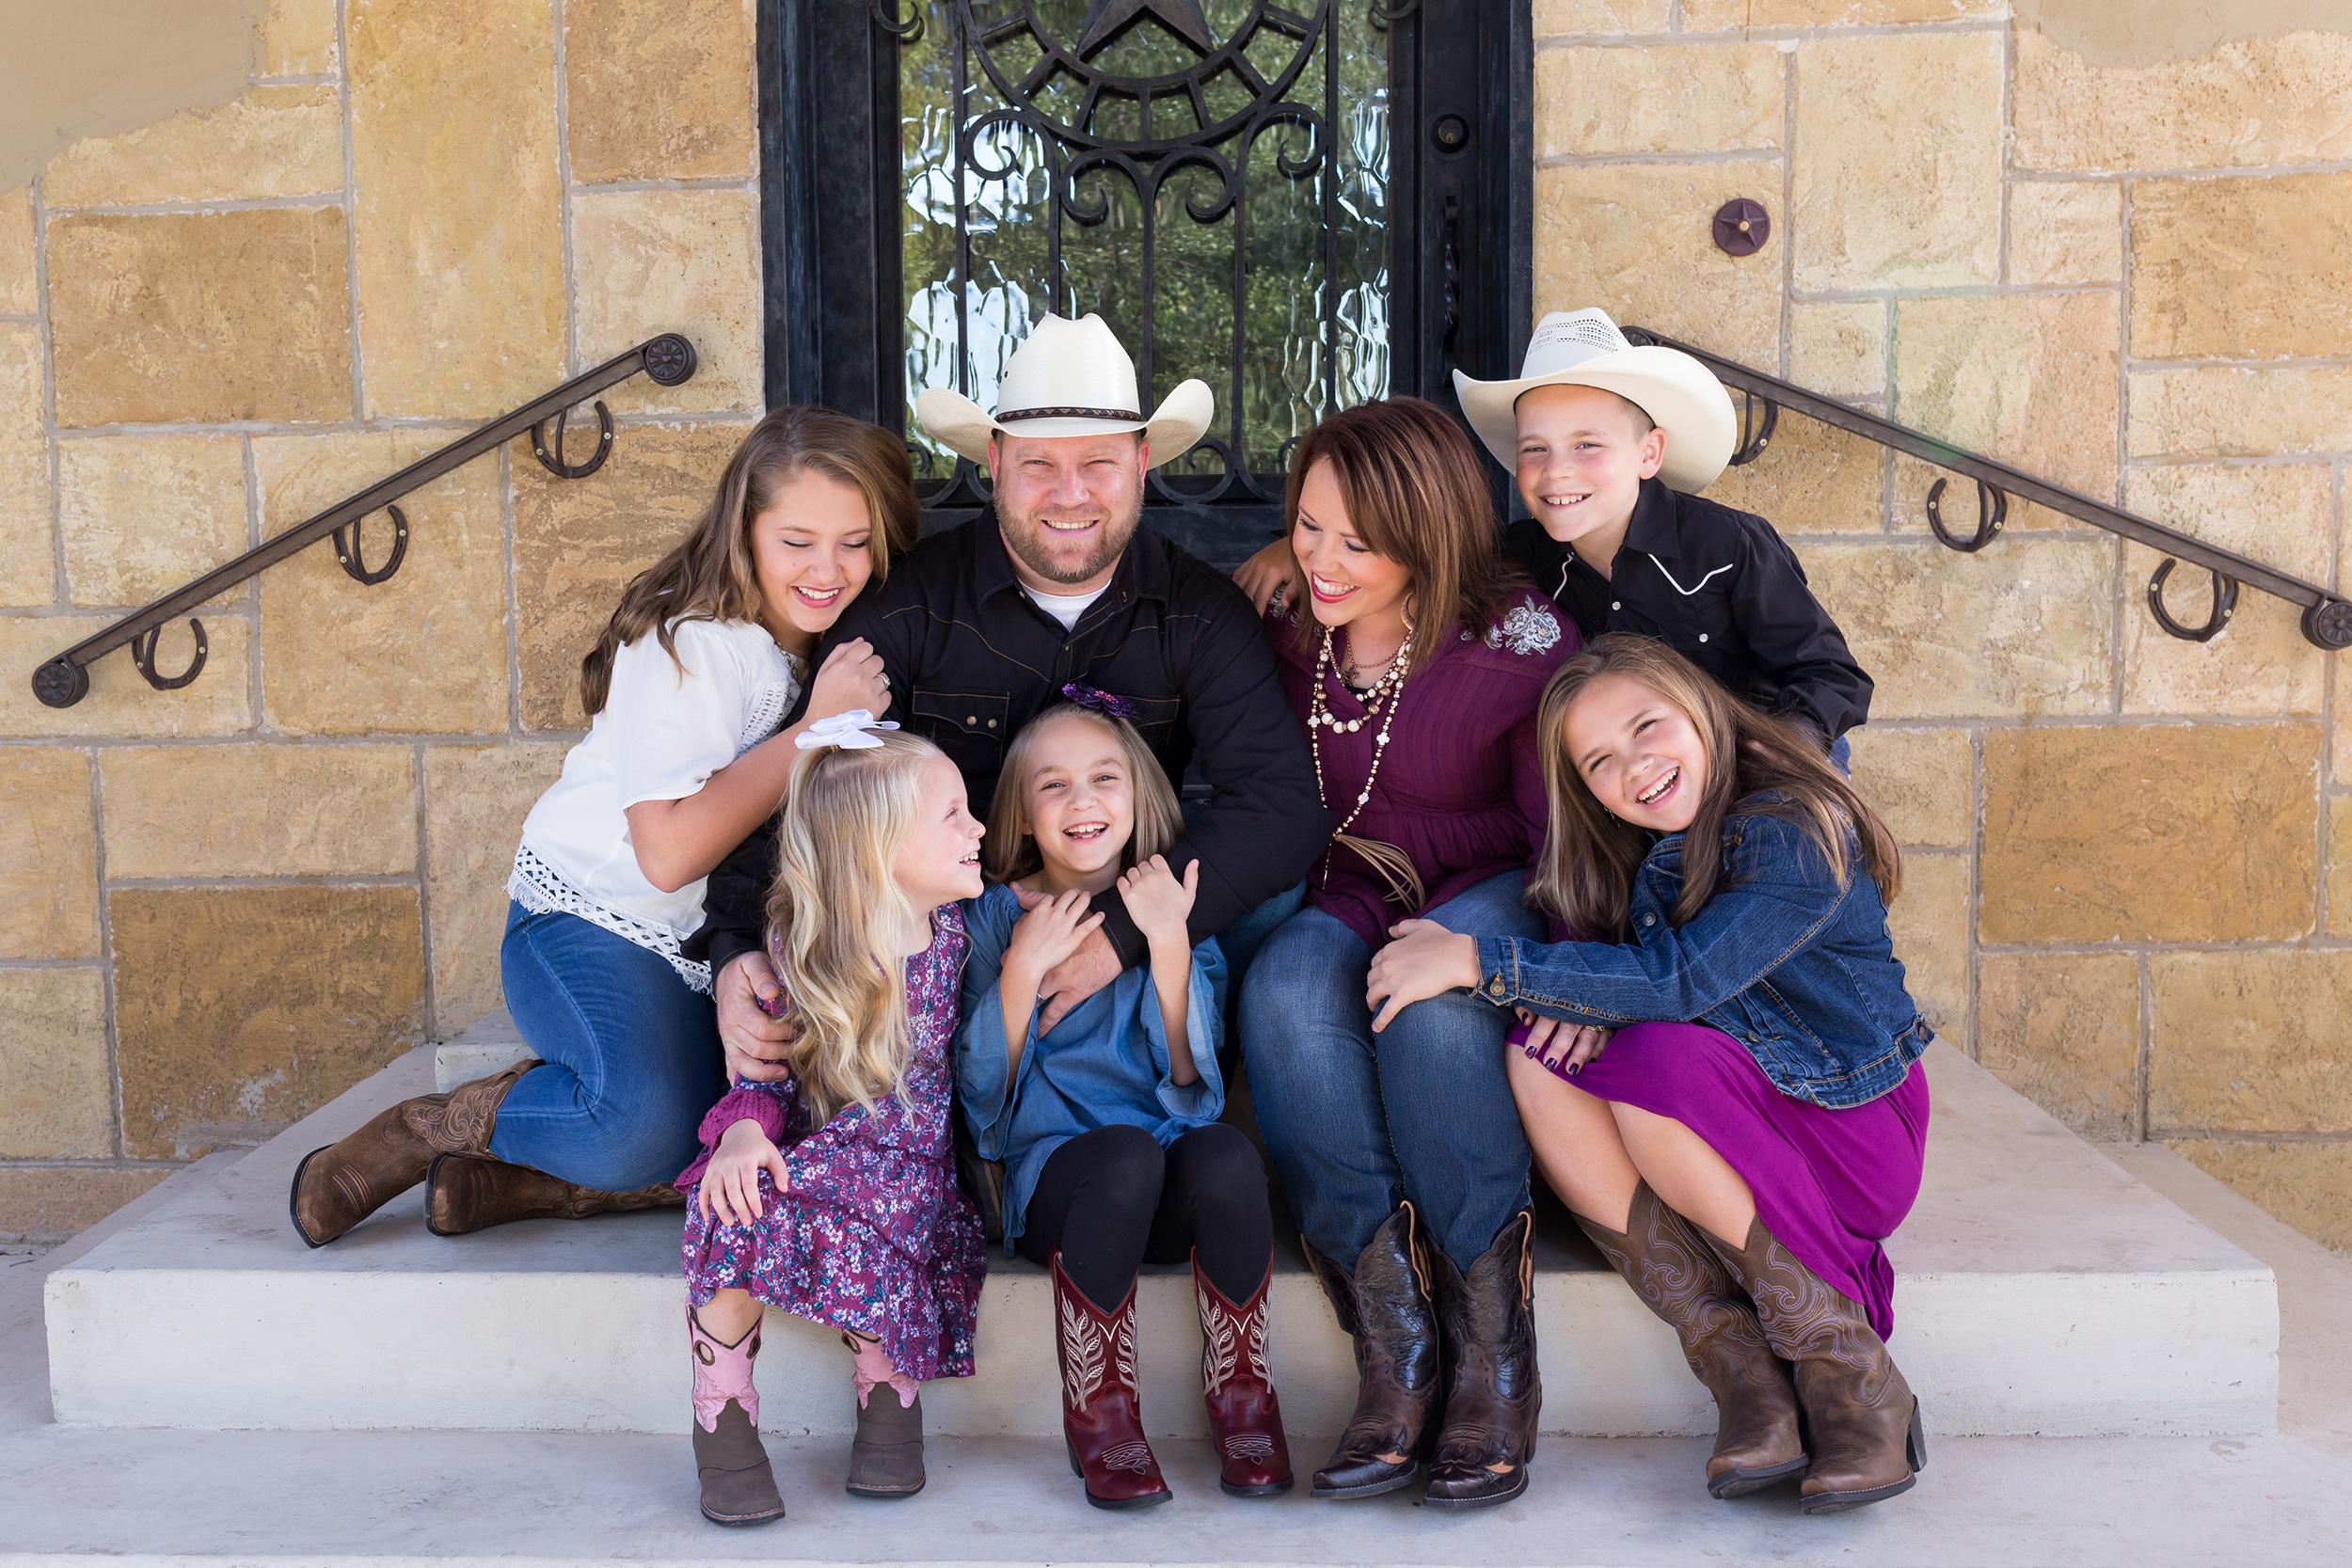 Family-sitting-porch-hugging-laughing.jpg